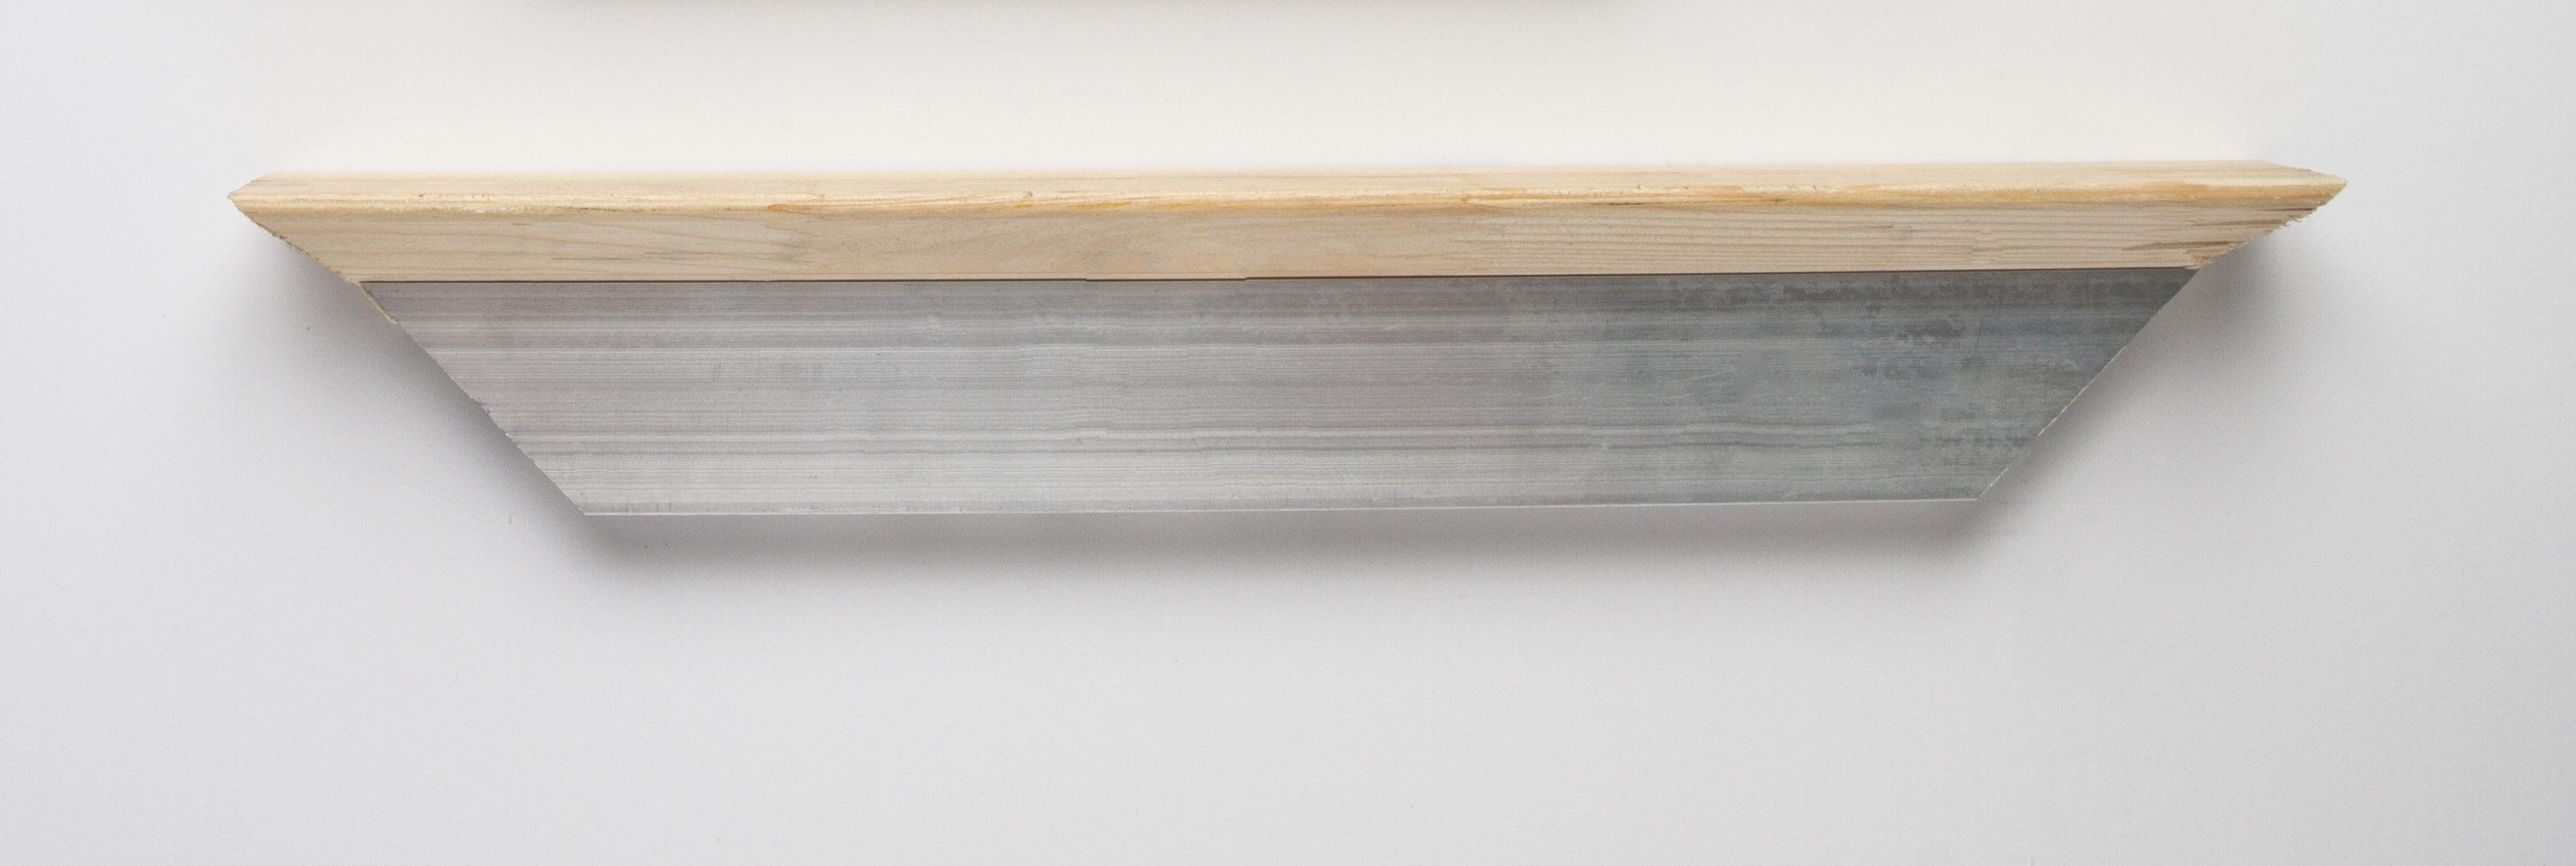 stretcher_bar_demo-6-flush-sides